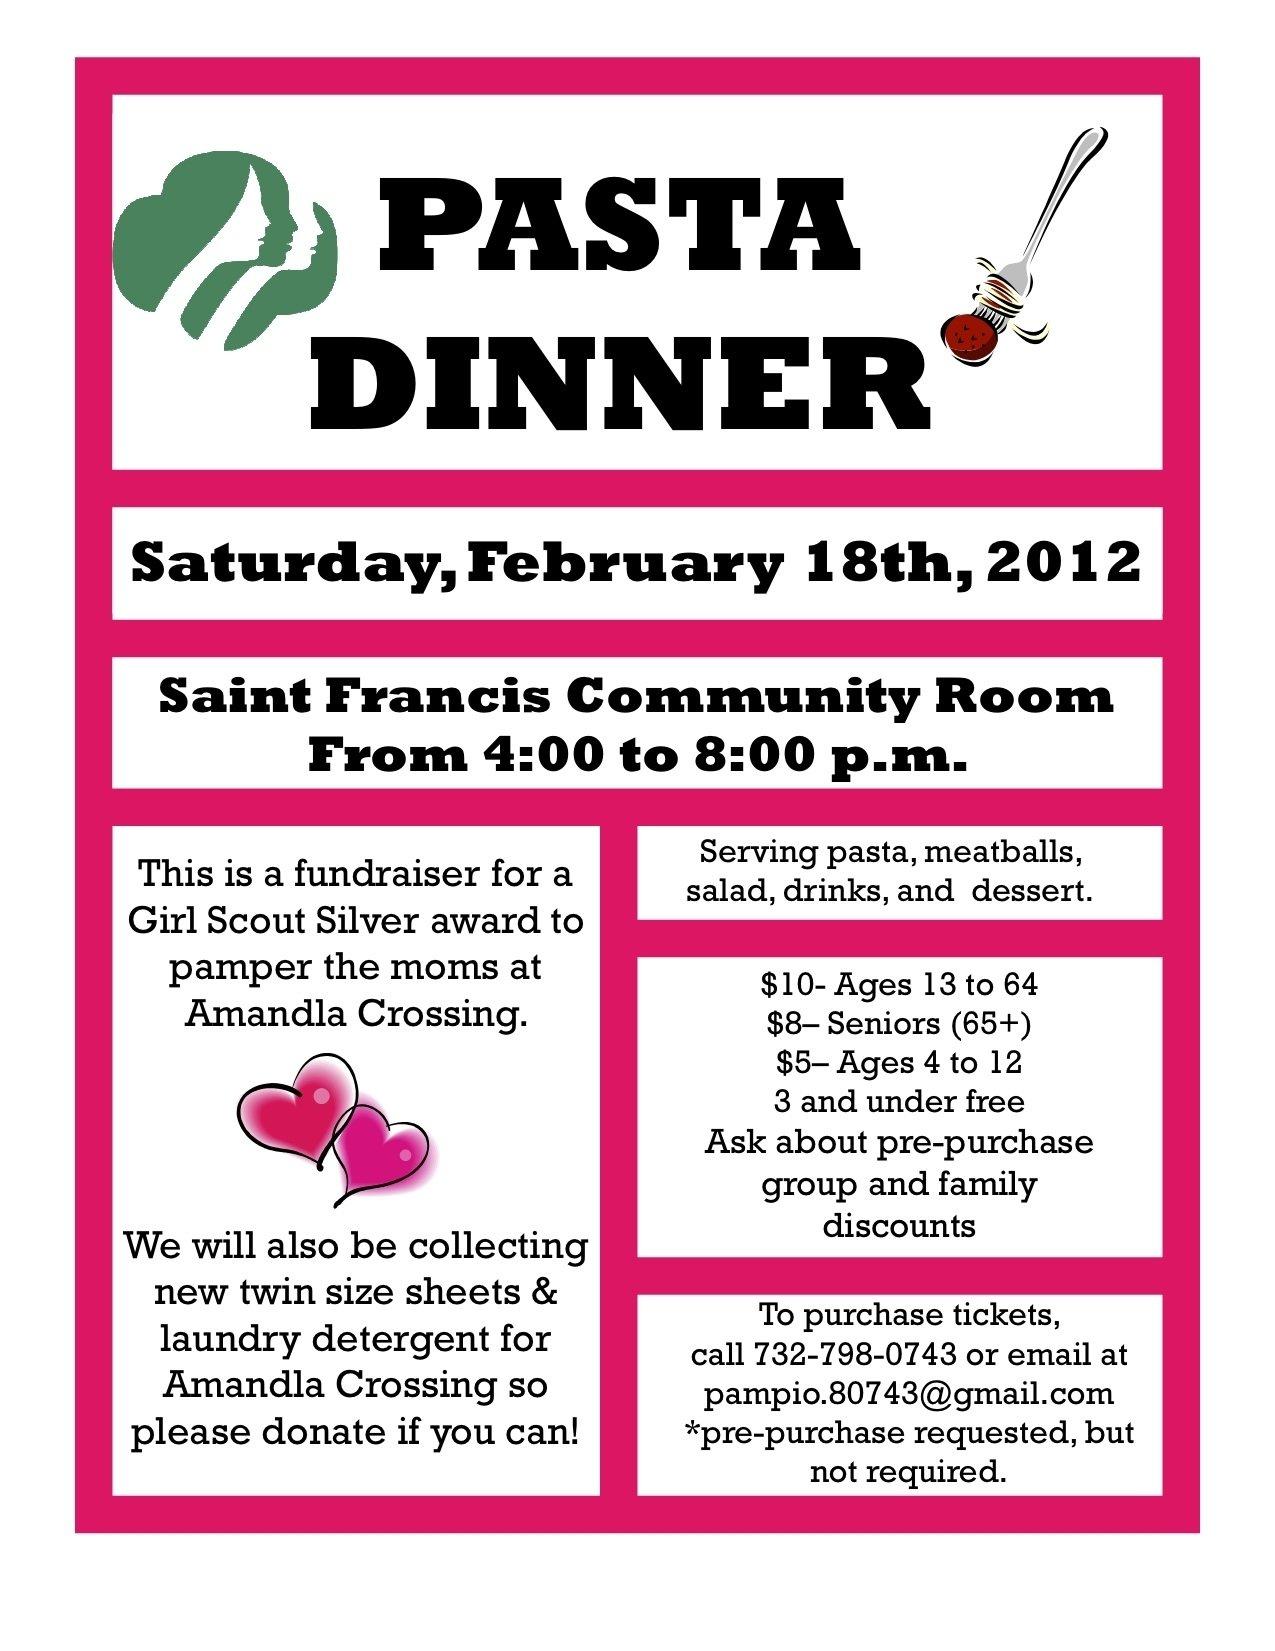 10 Fantastic Girl Scout Silver Award Ideas pasta dinner to support girl scout silver award february 18th 1 2020